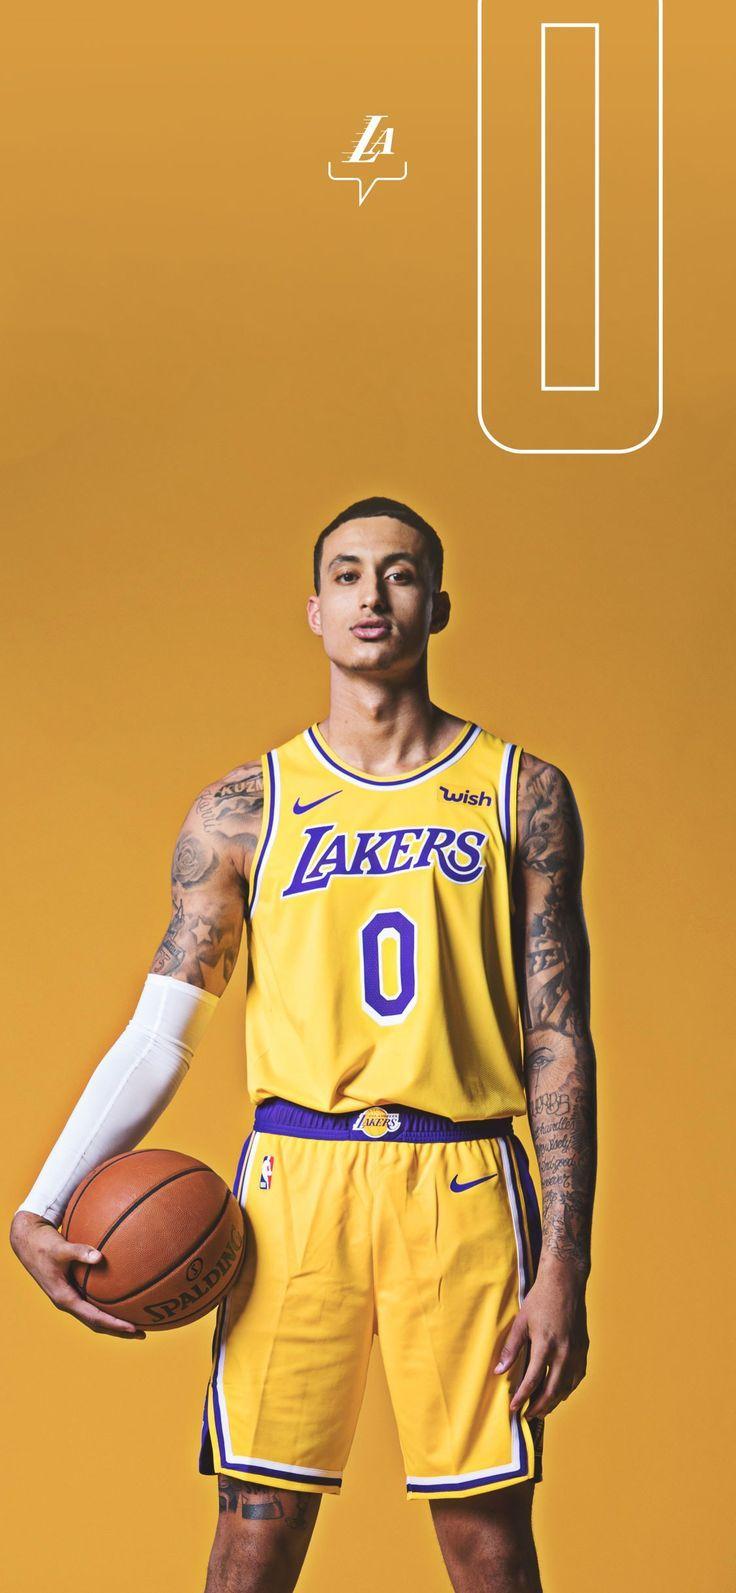 Los Angeles Lakers Uniform Basketball In 2020 Lakers Wallpaper Kyle Kuzma Los Angeles Lakers